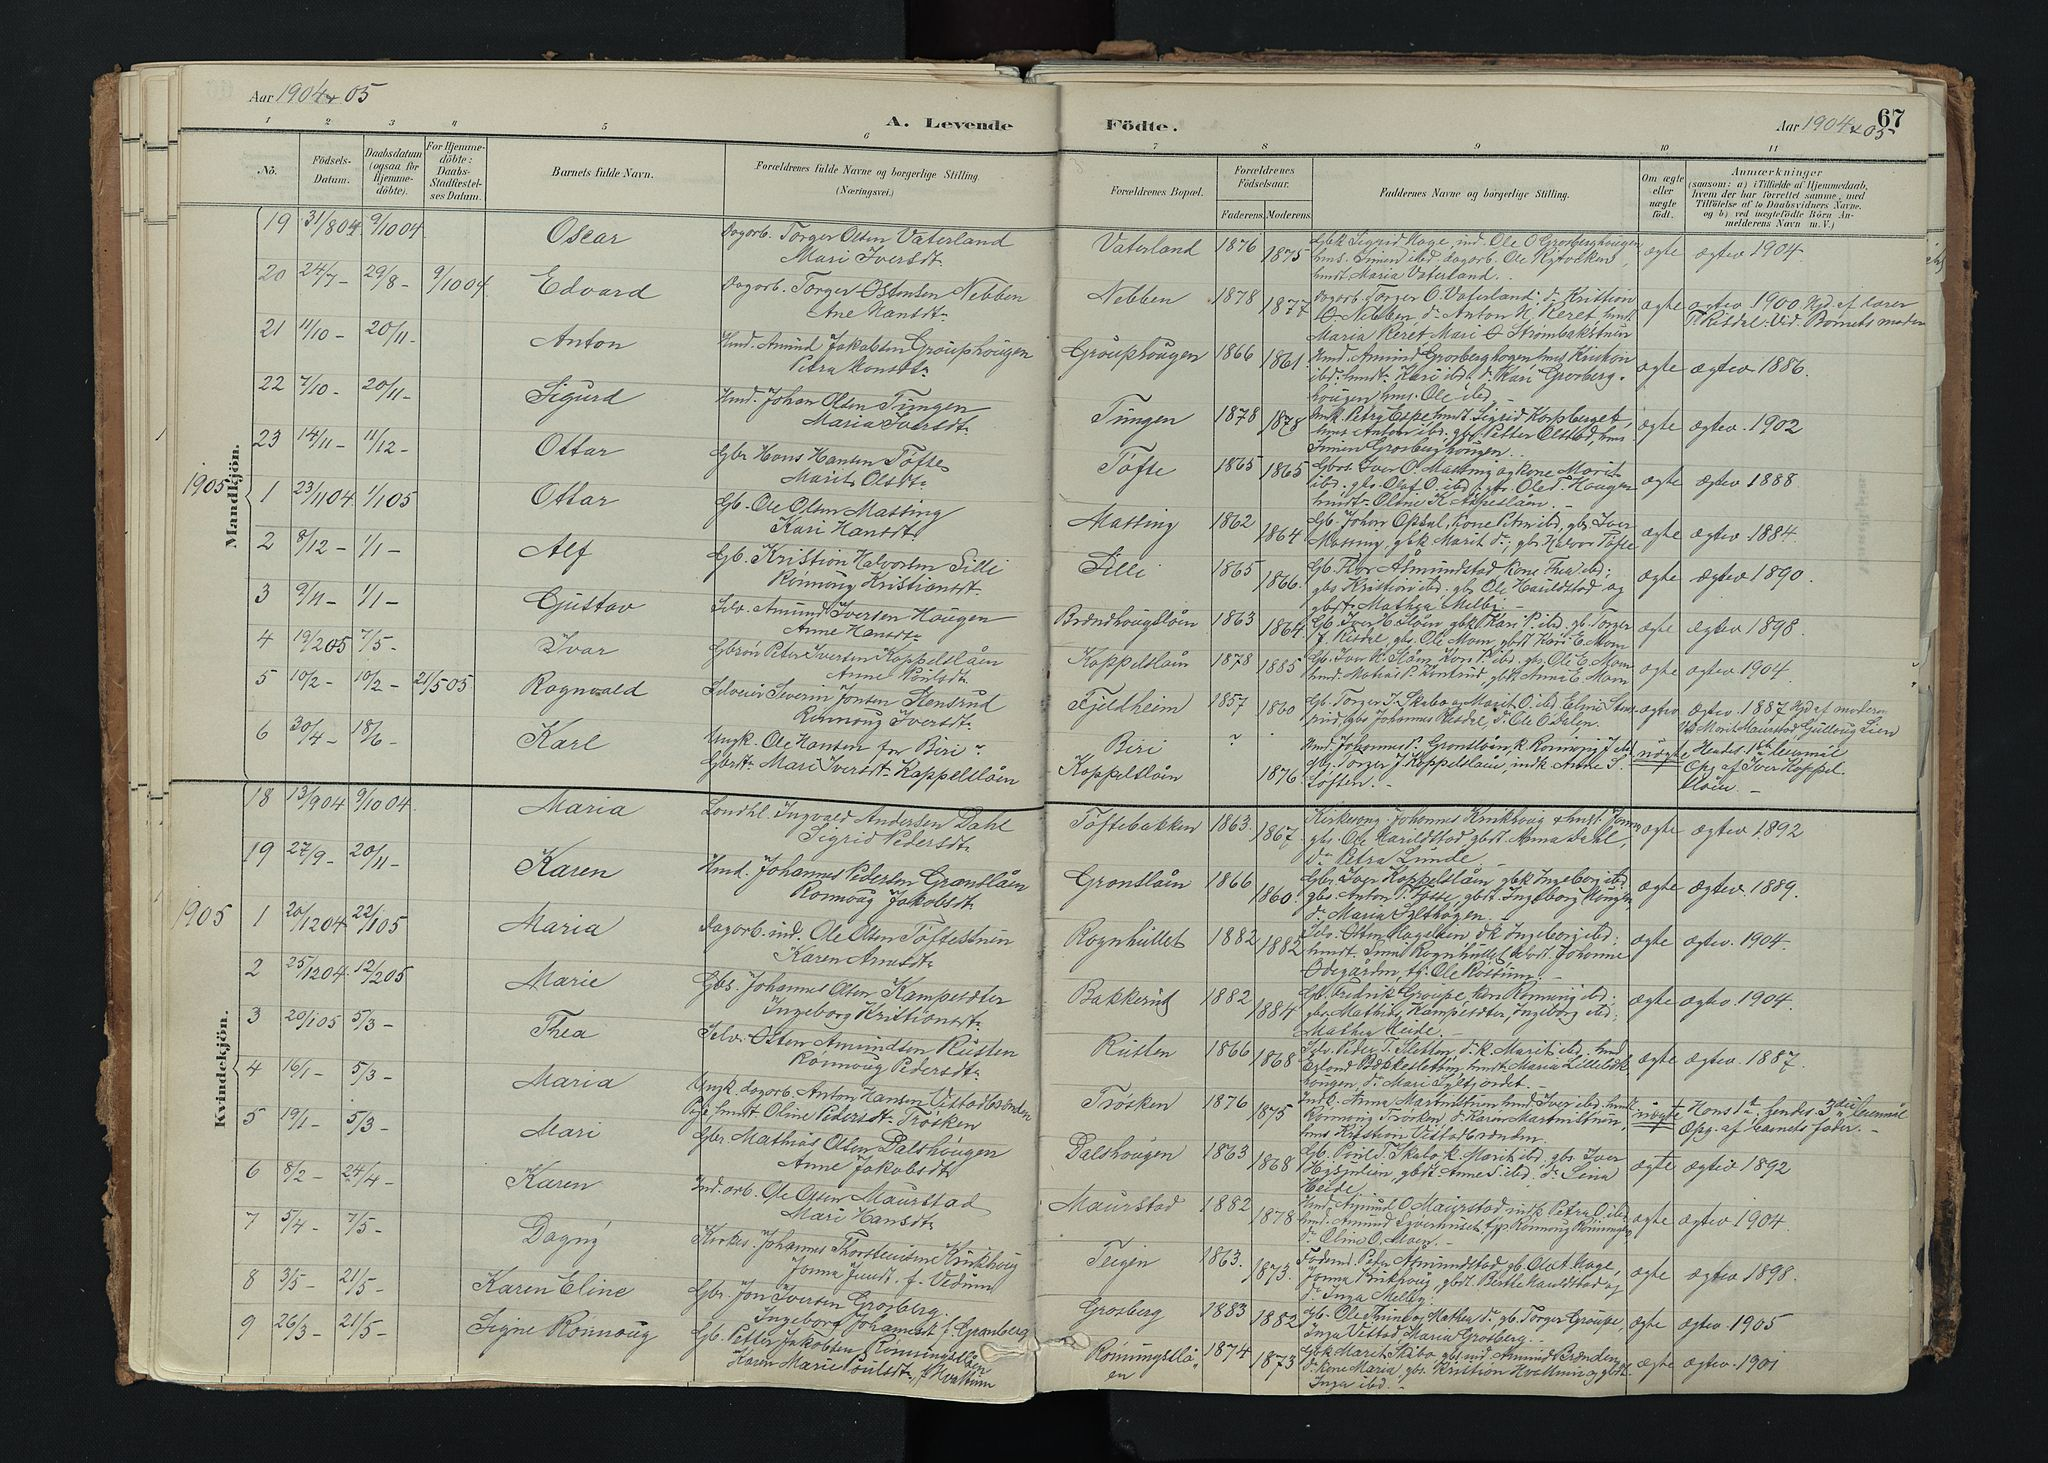 SAH, Nord-Fron prestekontor, Ministerialbok nr. 5, 1884-1914, s. 67